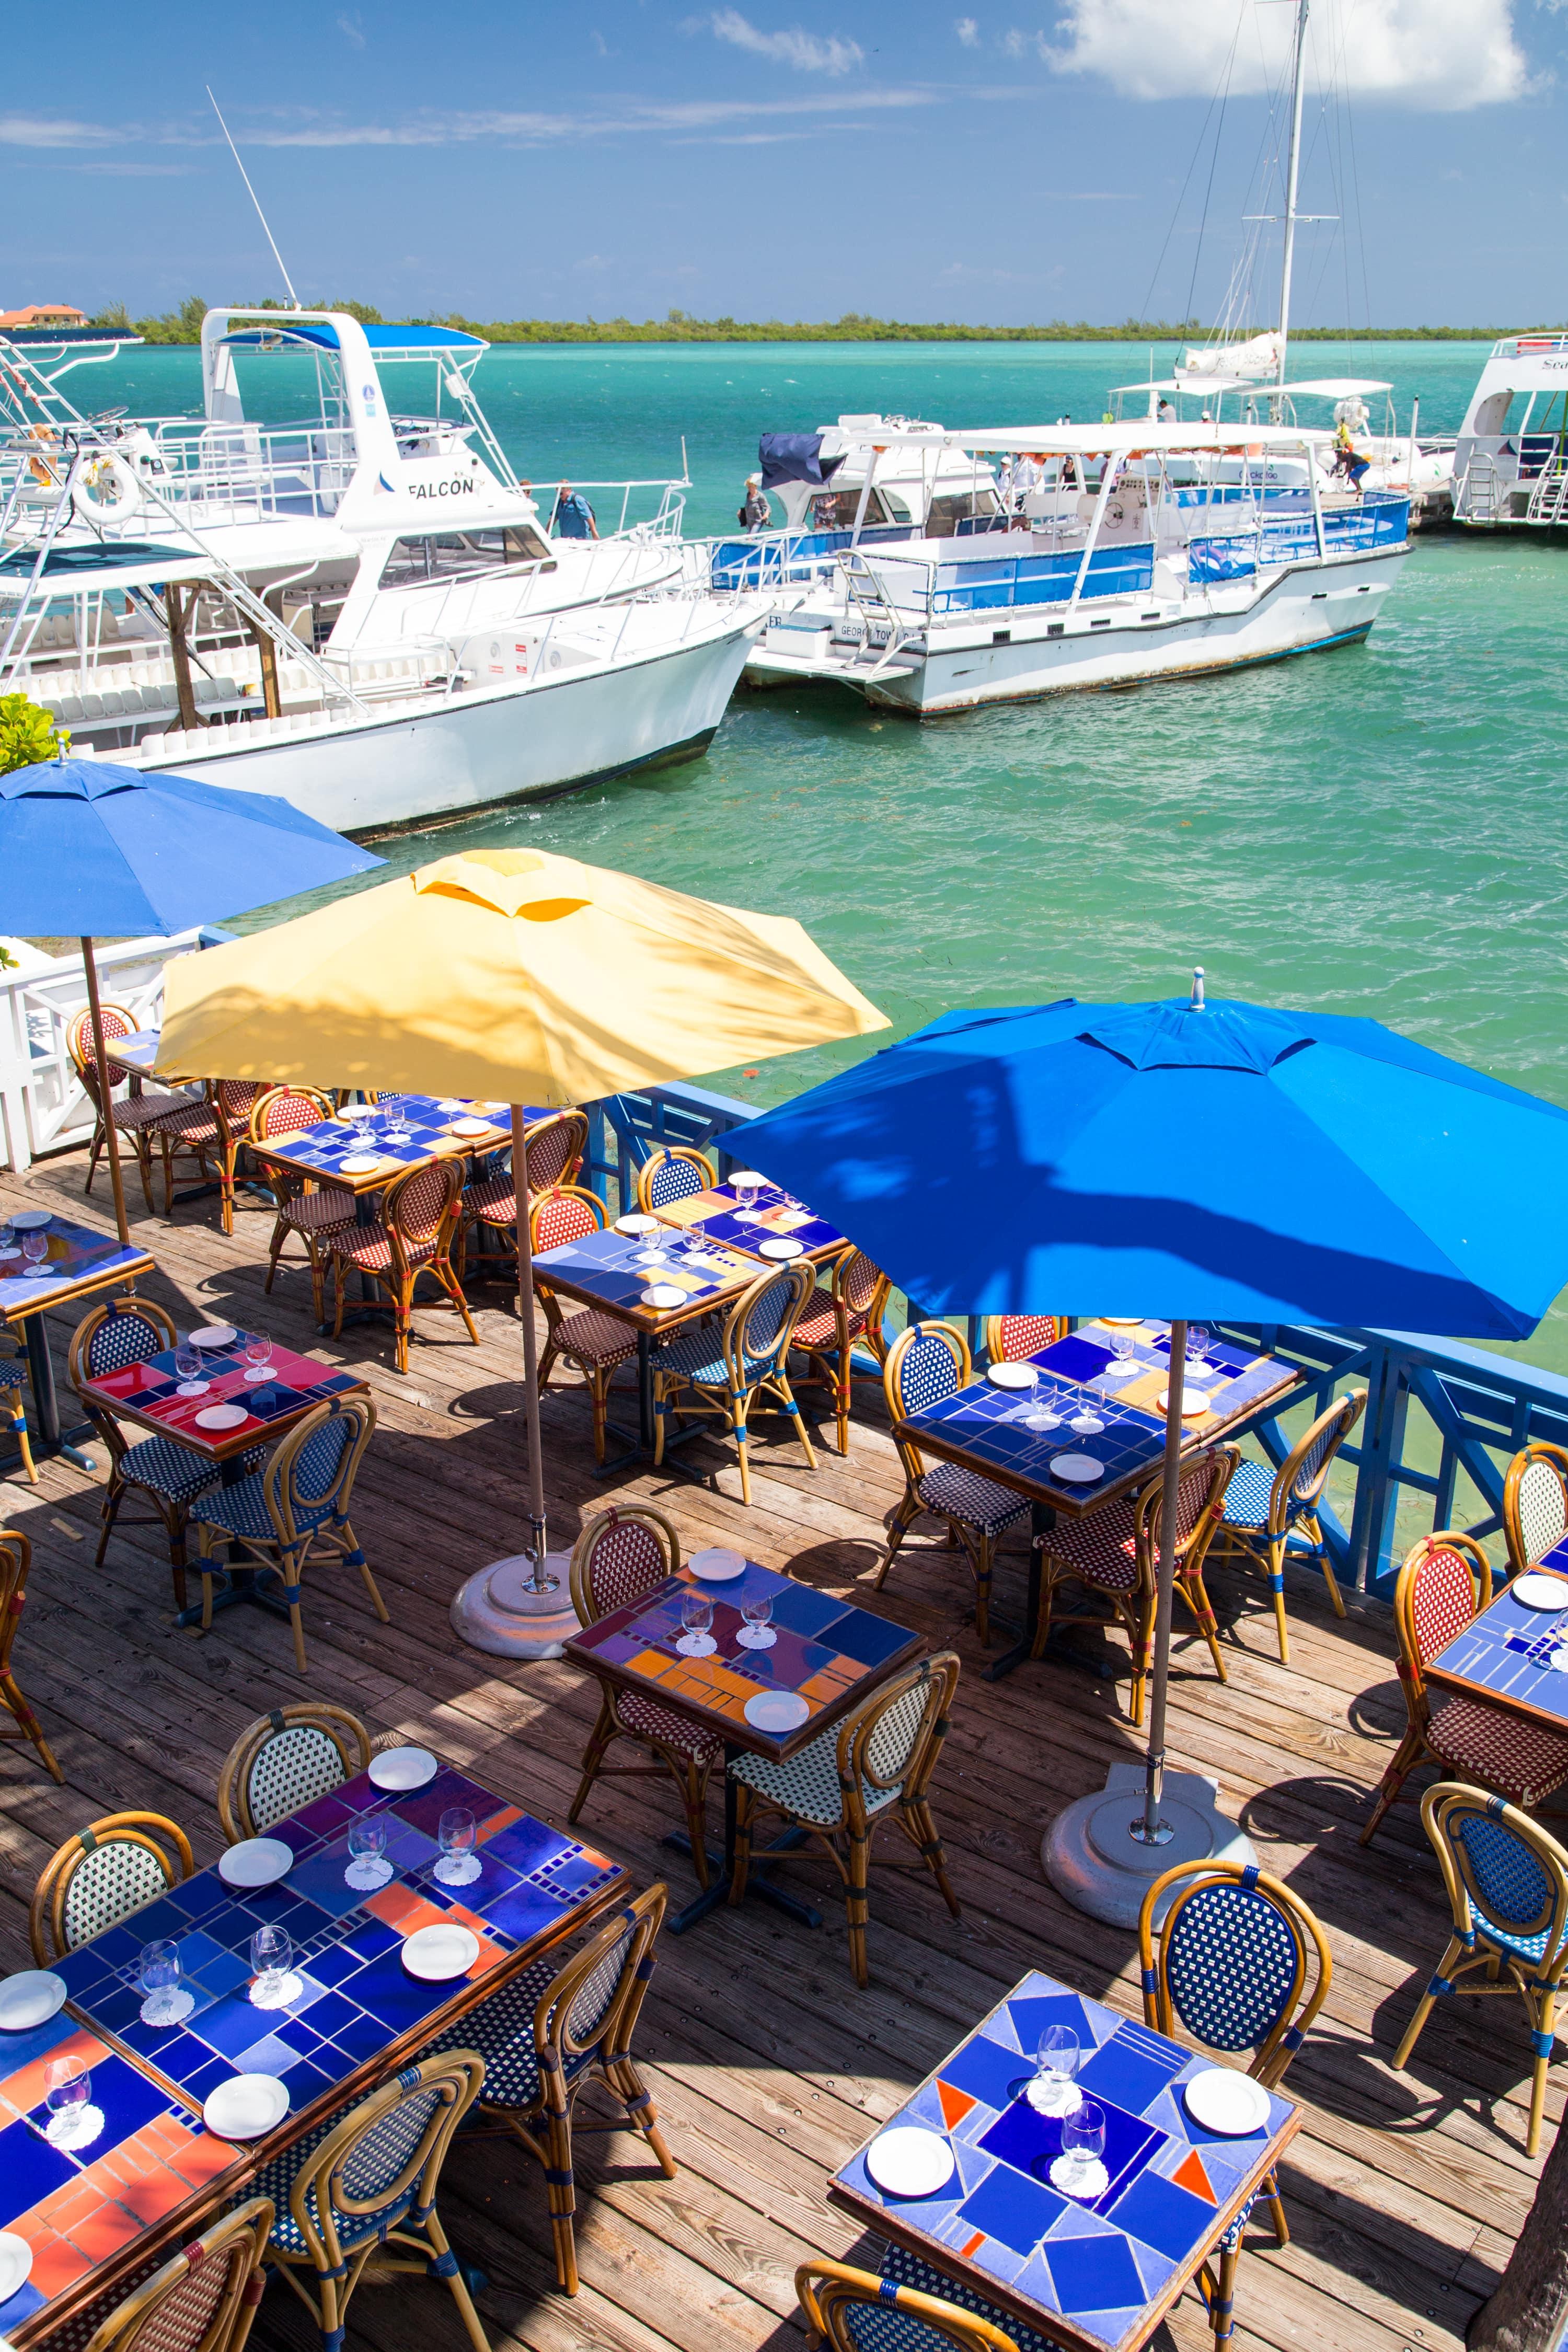 Calypso Grill Deck Ariel Shot